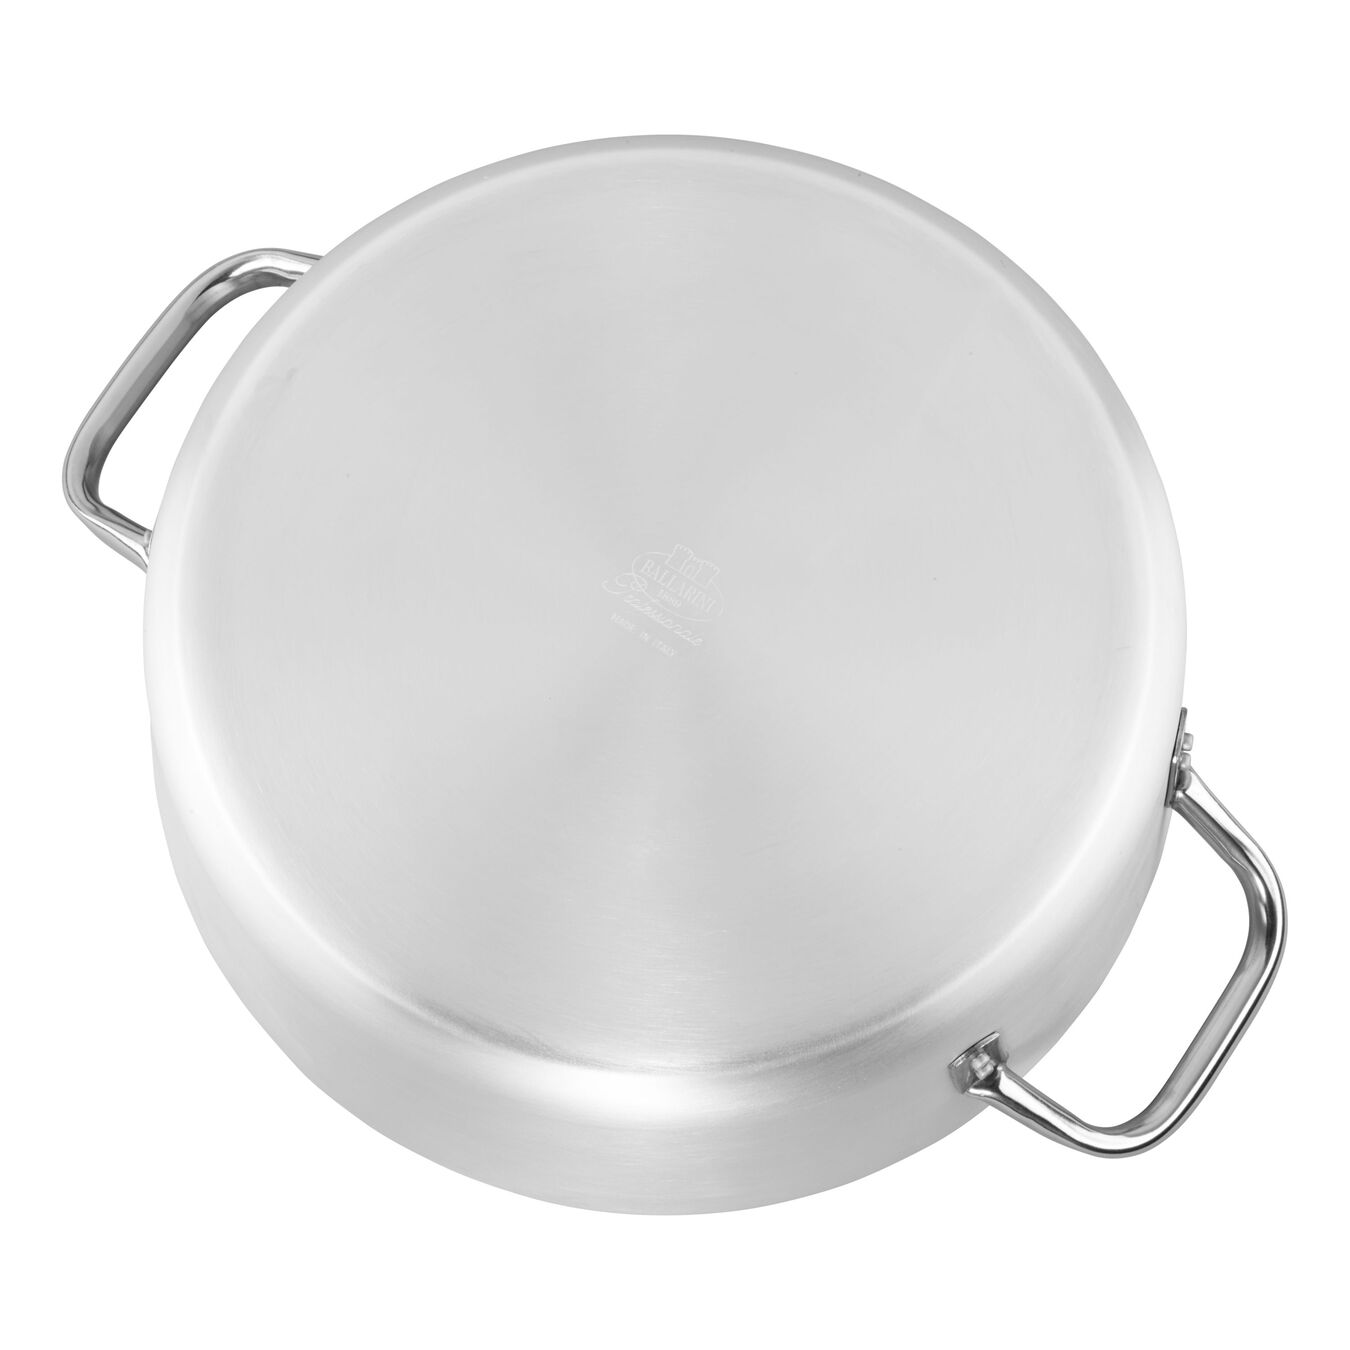 17.5-qt Aluminum Braiser,,large 2